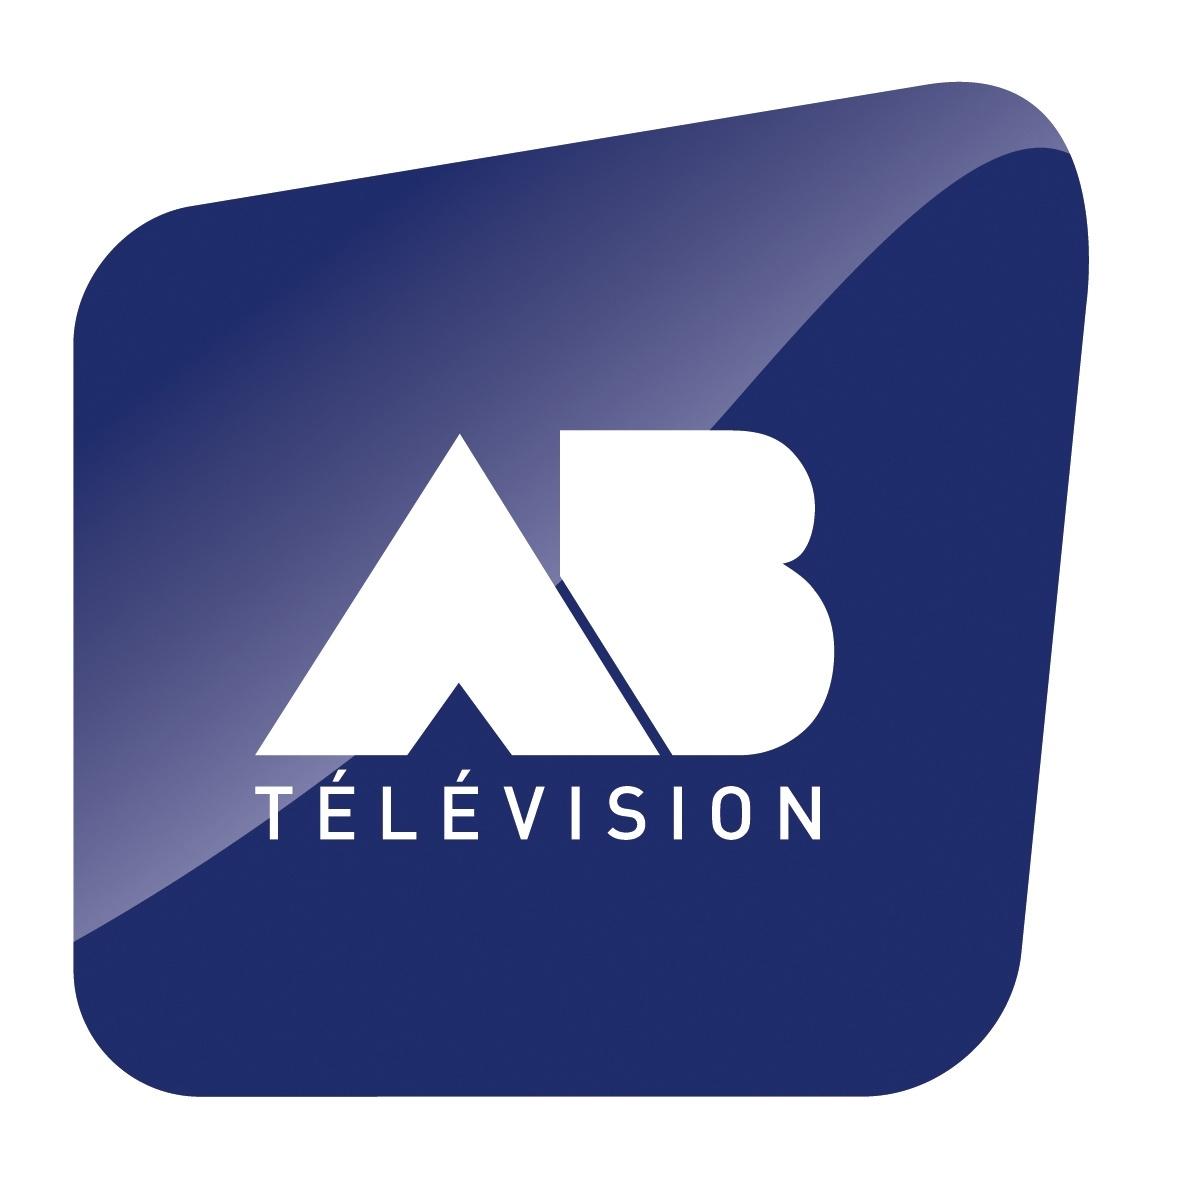 AB TELEVISION